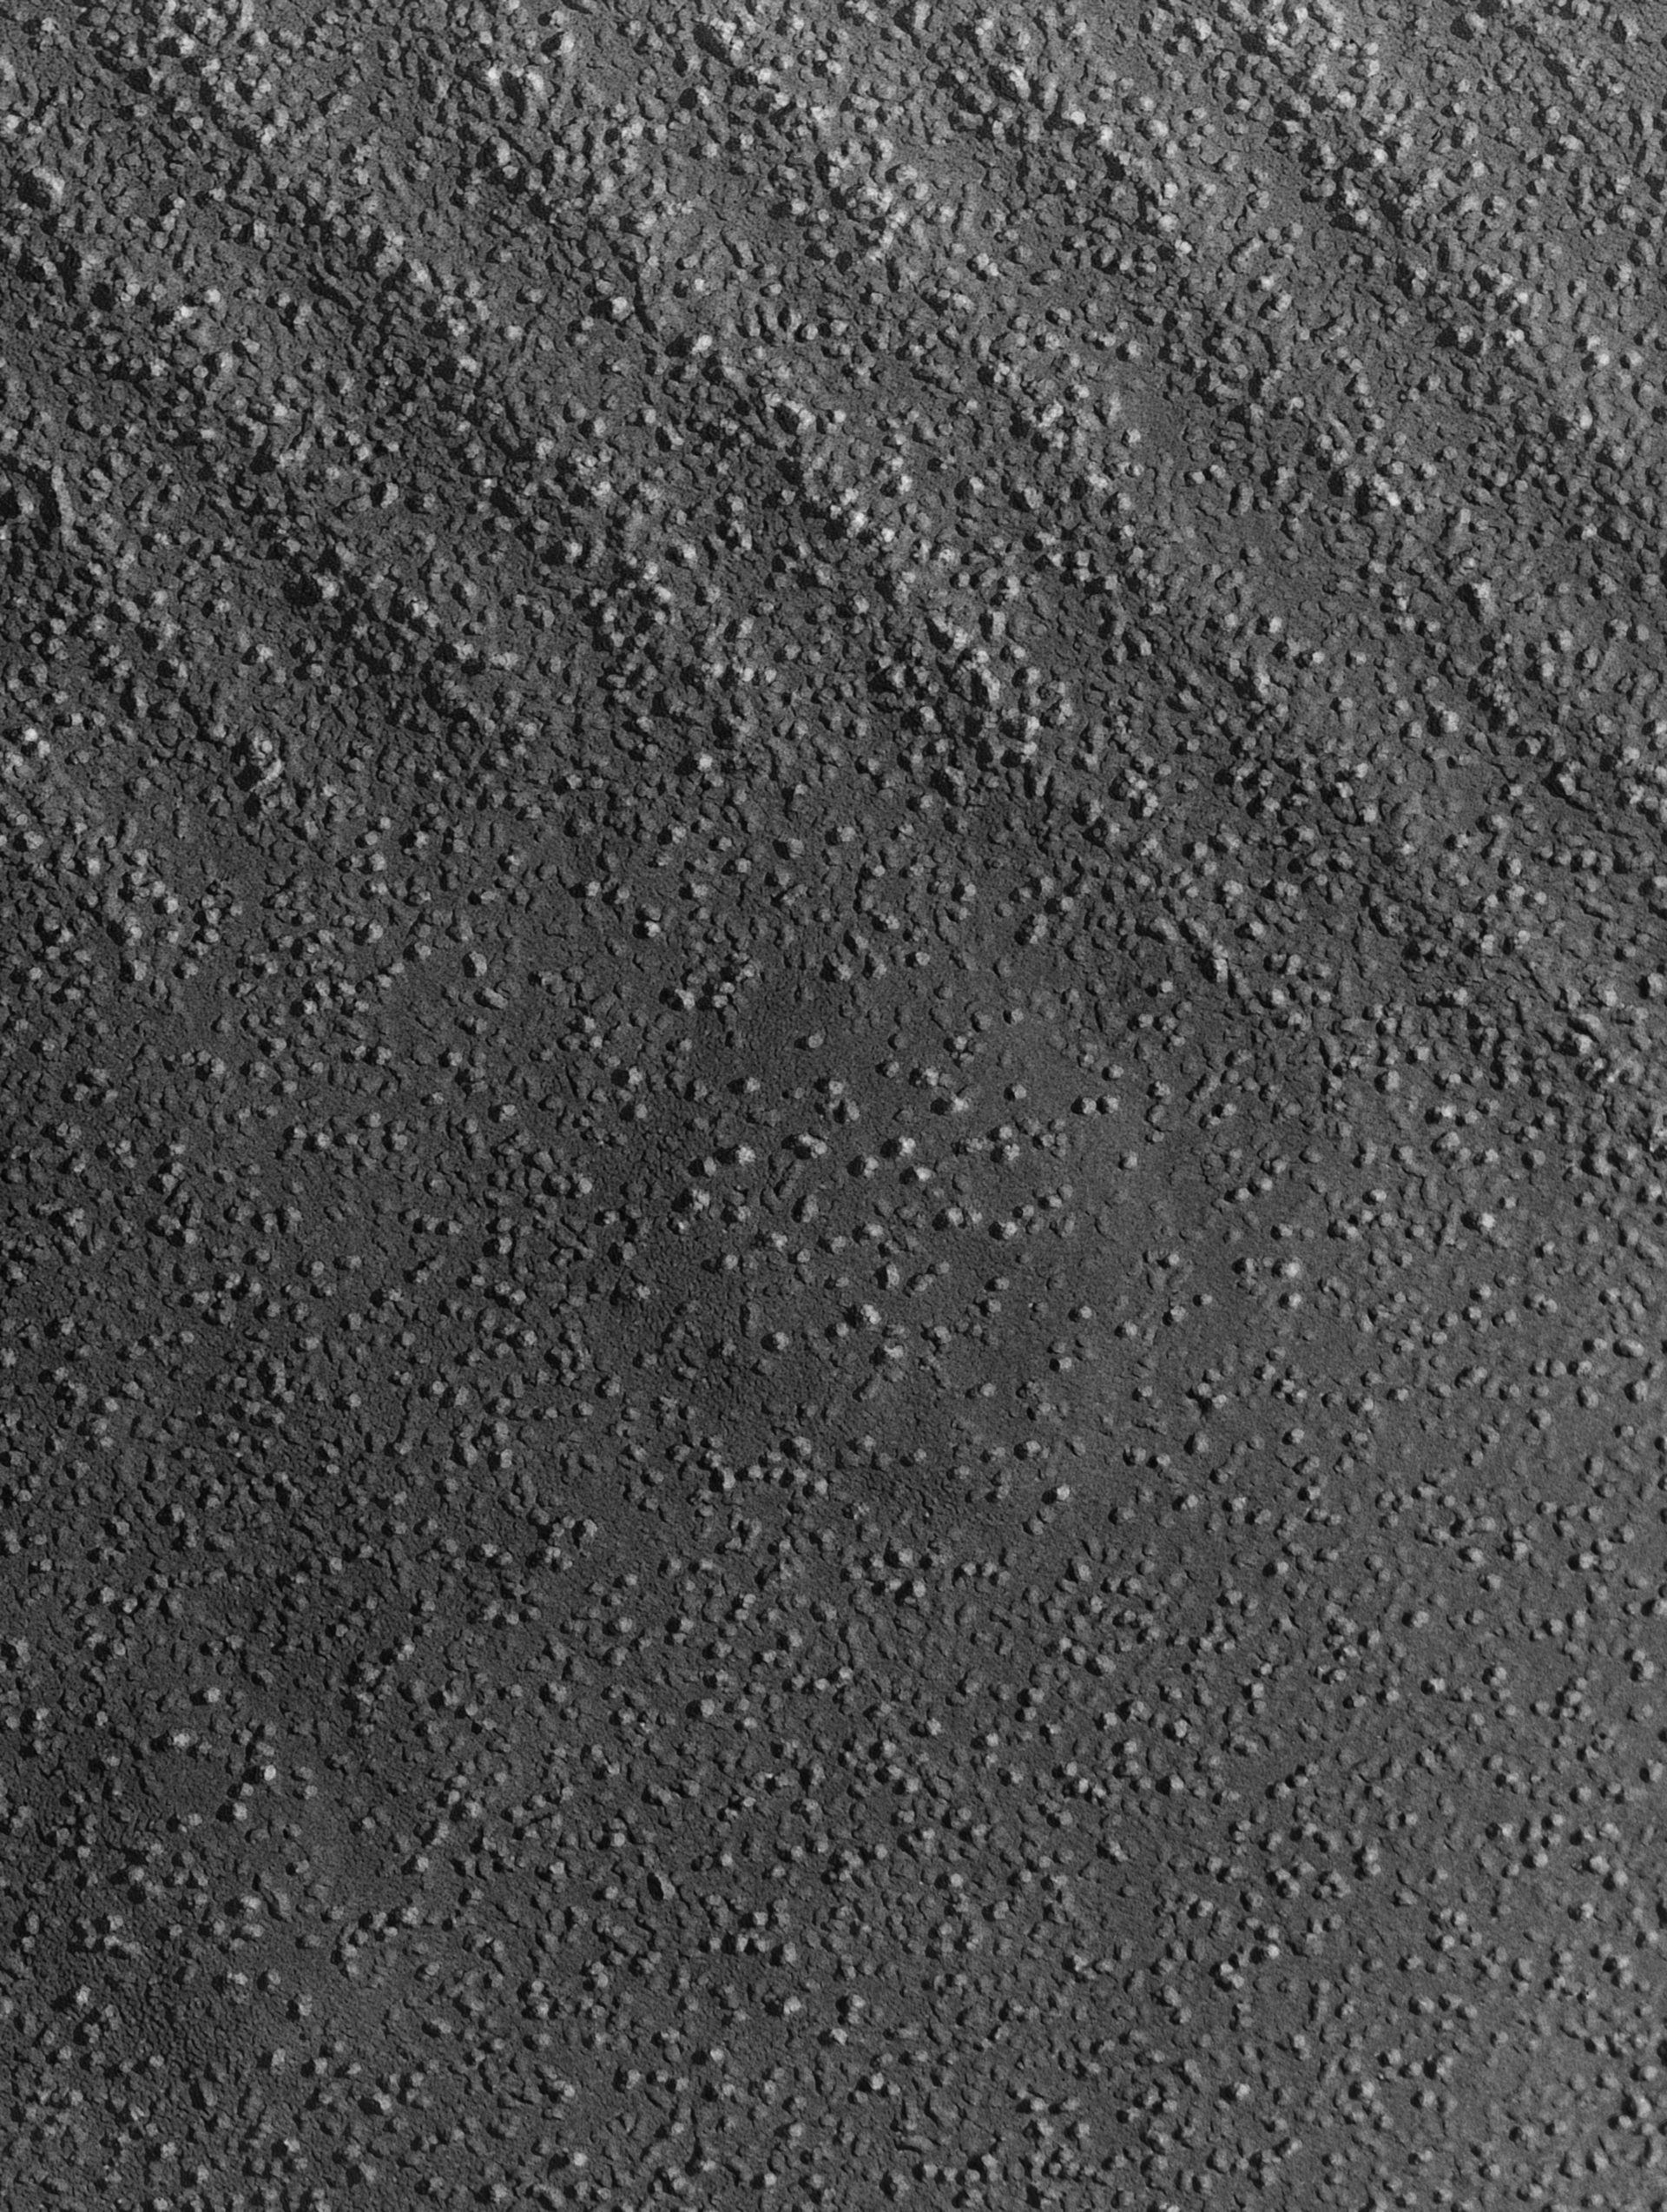 Damselfly (Sarcoplasmic reticulum) - CIL:18447